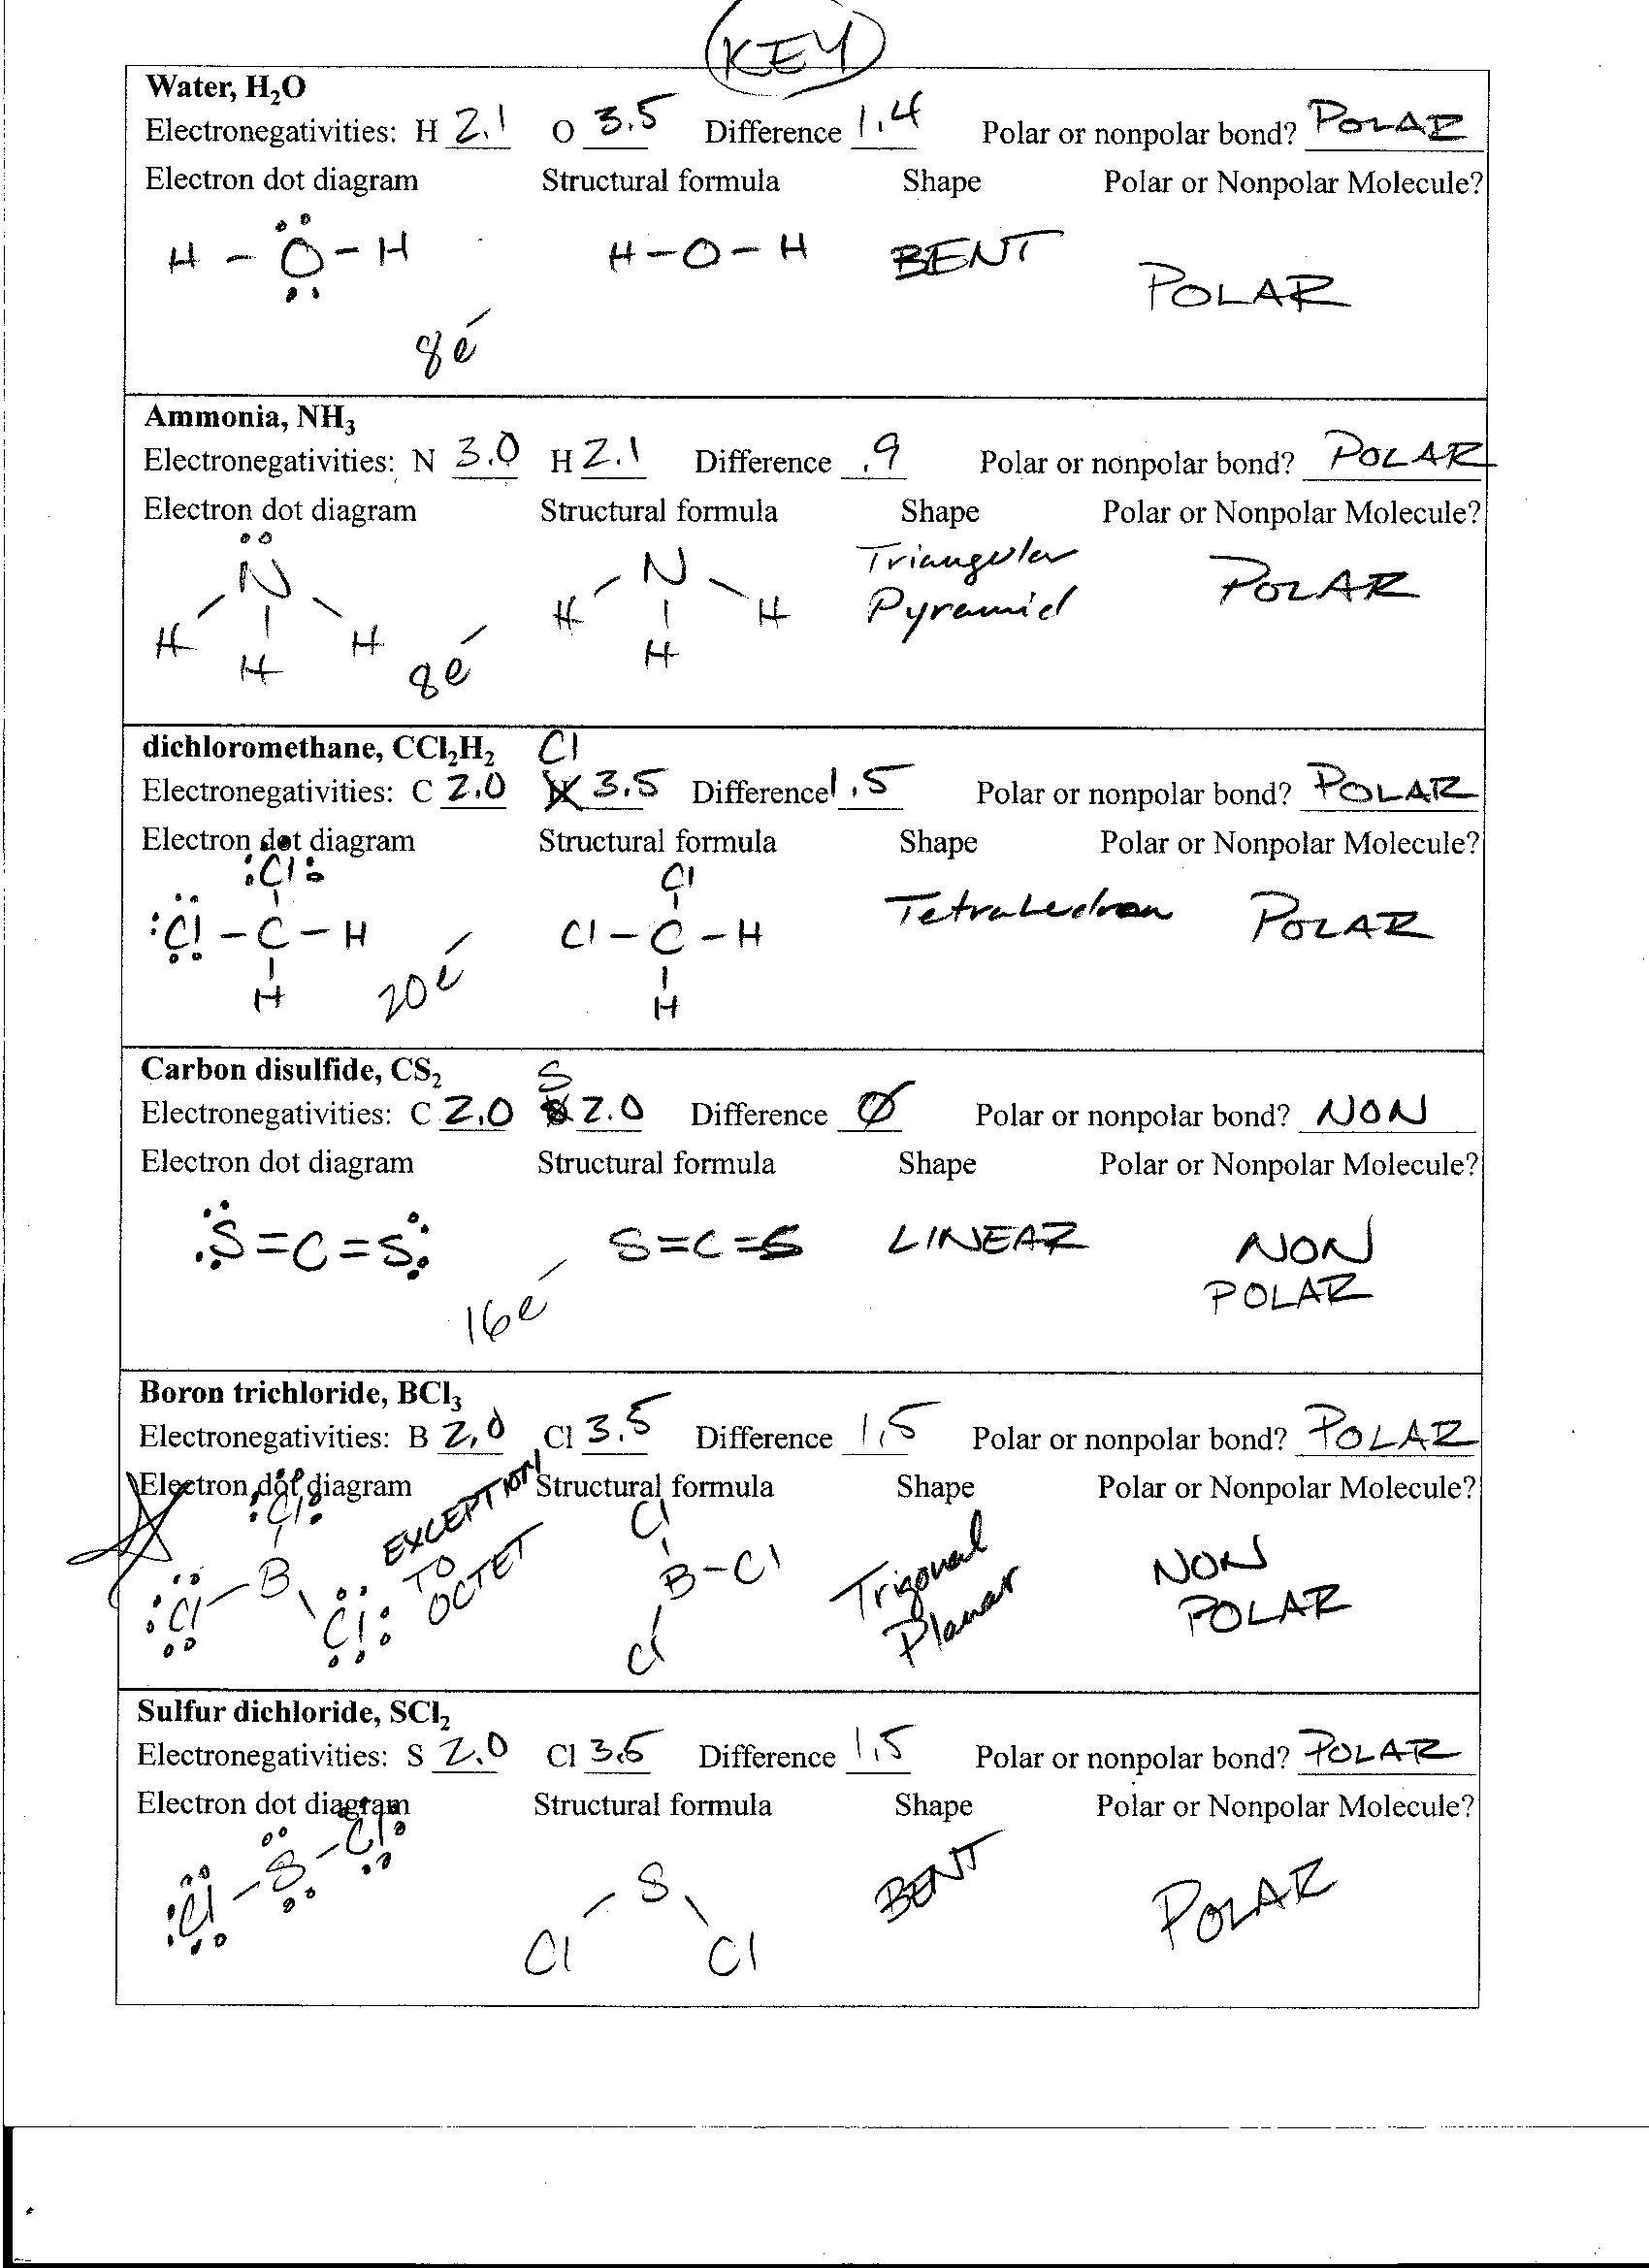 Molecular Polarity Worksheets